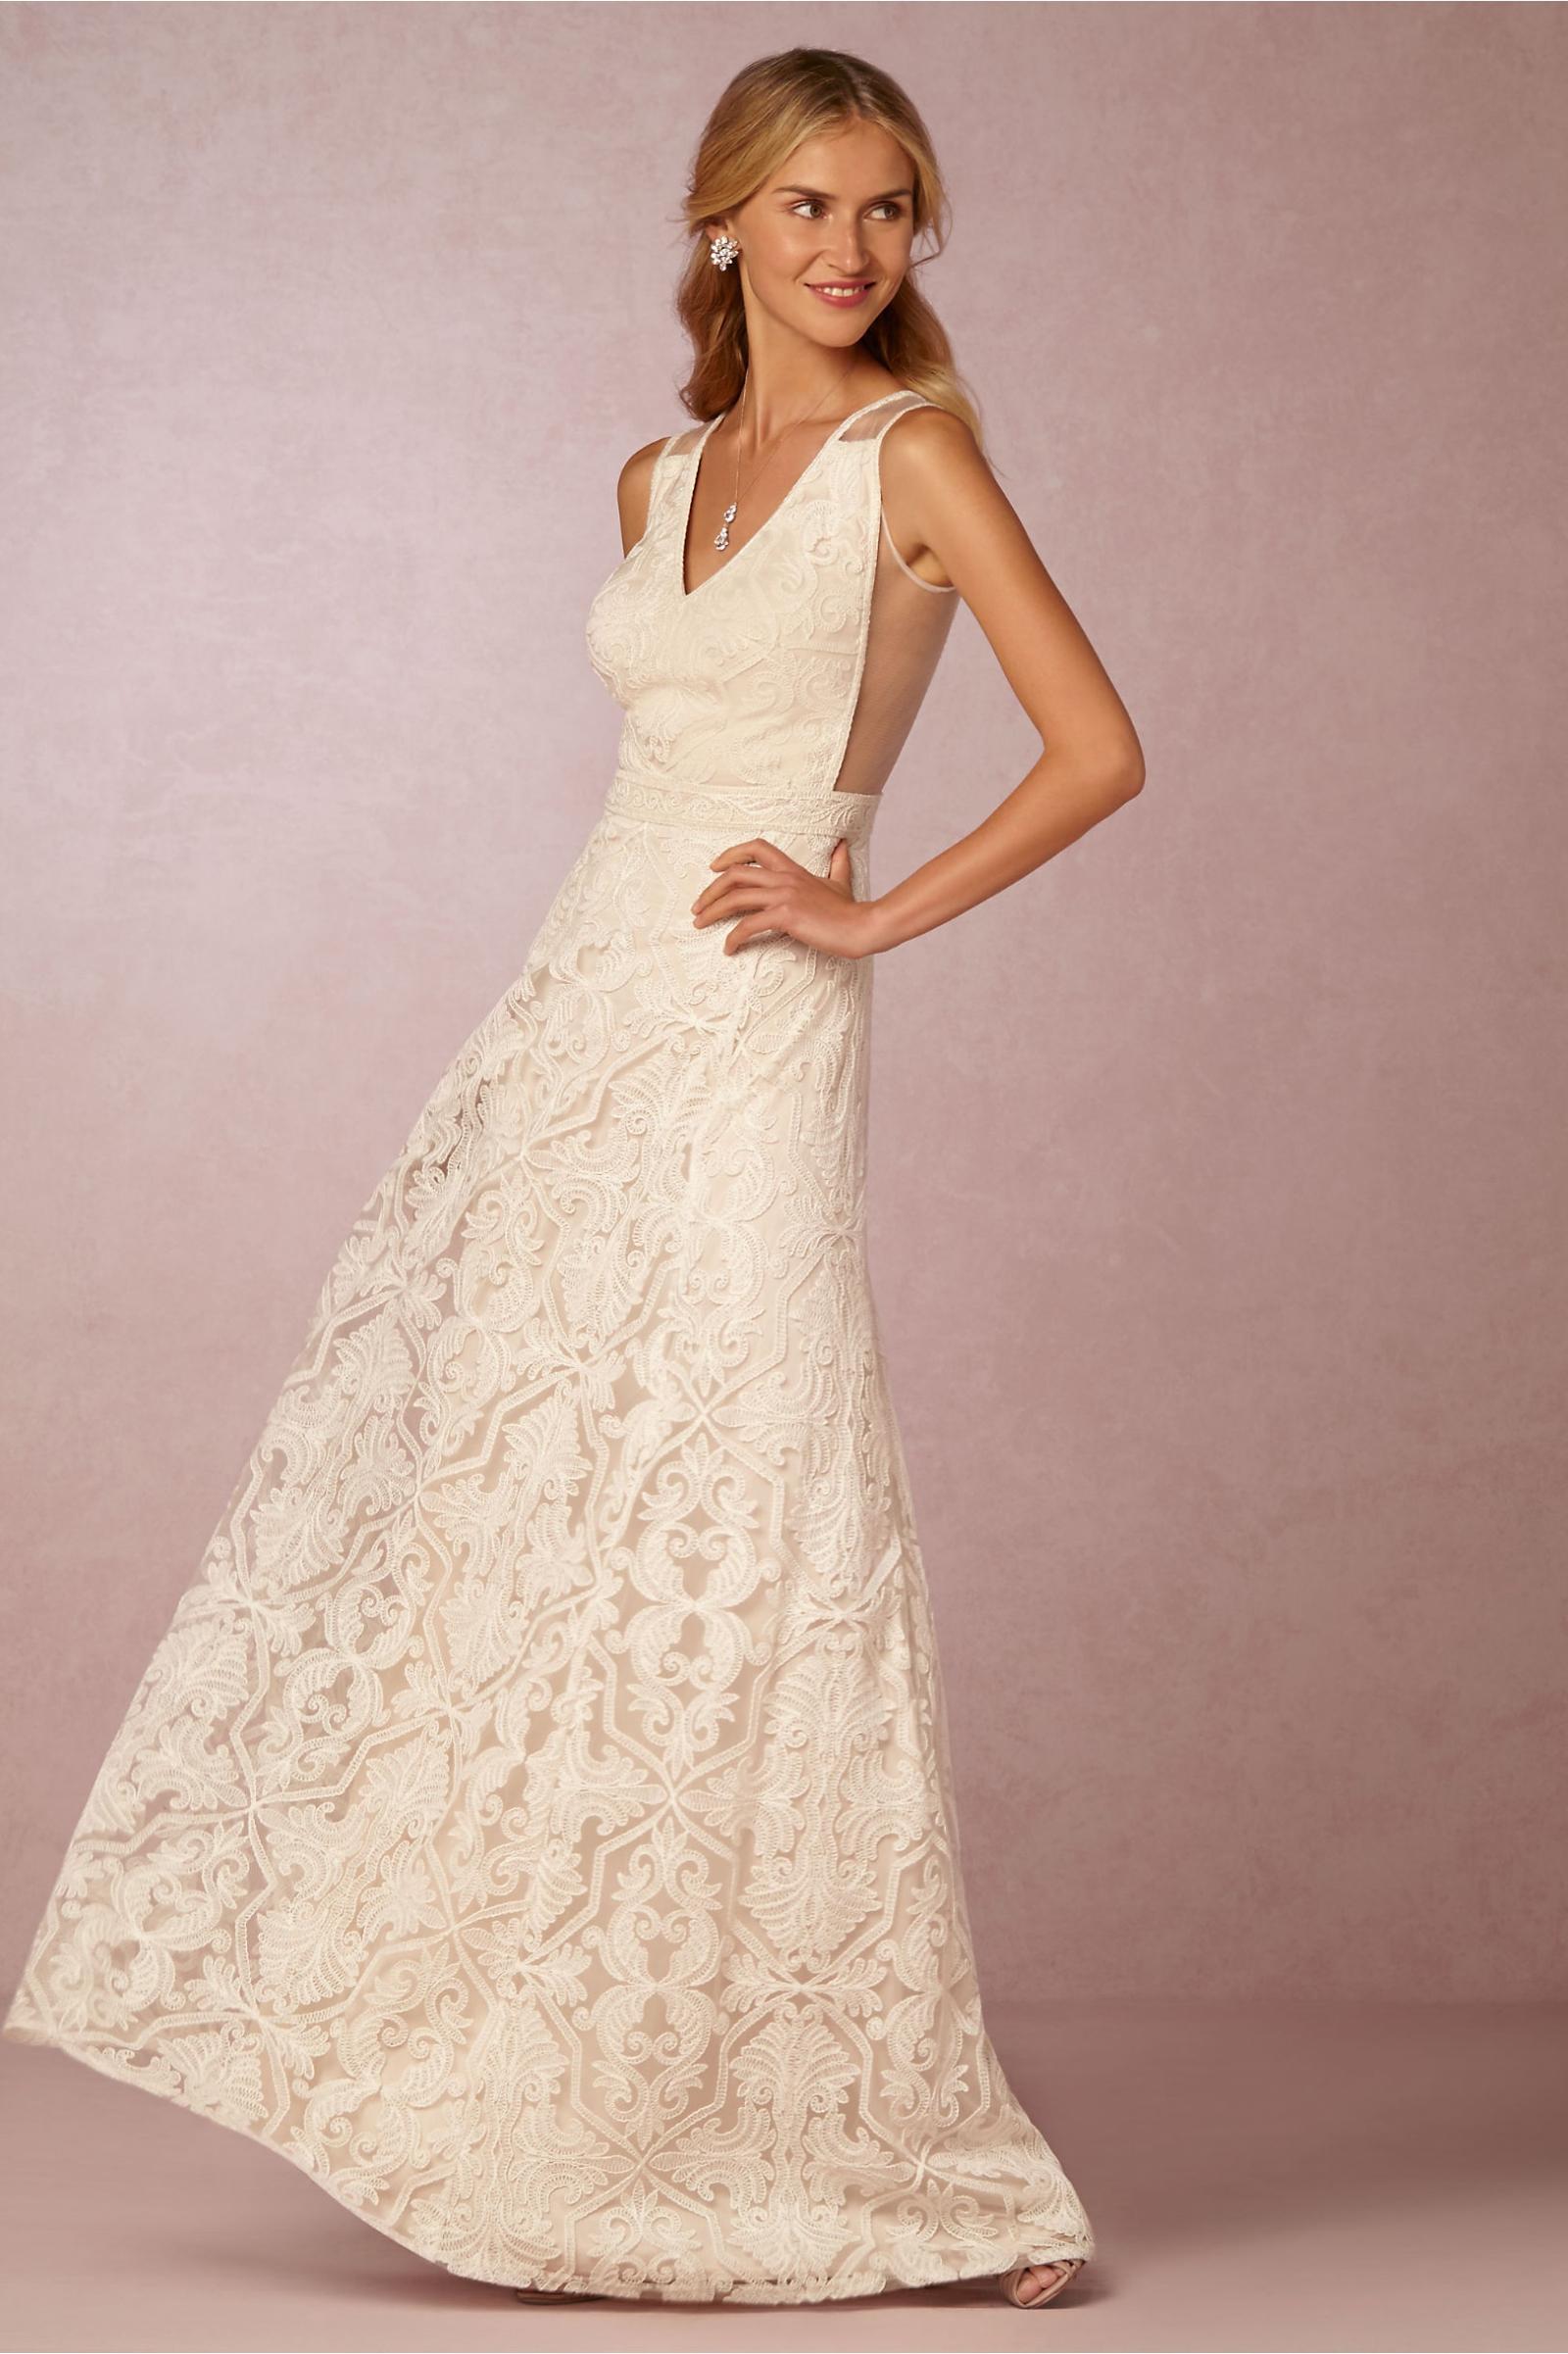 Tadashi shoji bhldn pendleton wedding dress on sale 63 off for Bhldn wedding dress sale